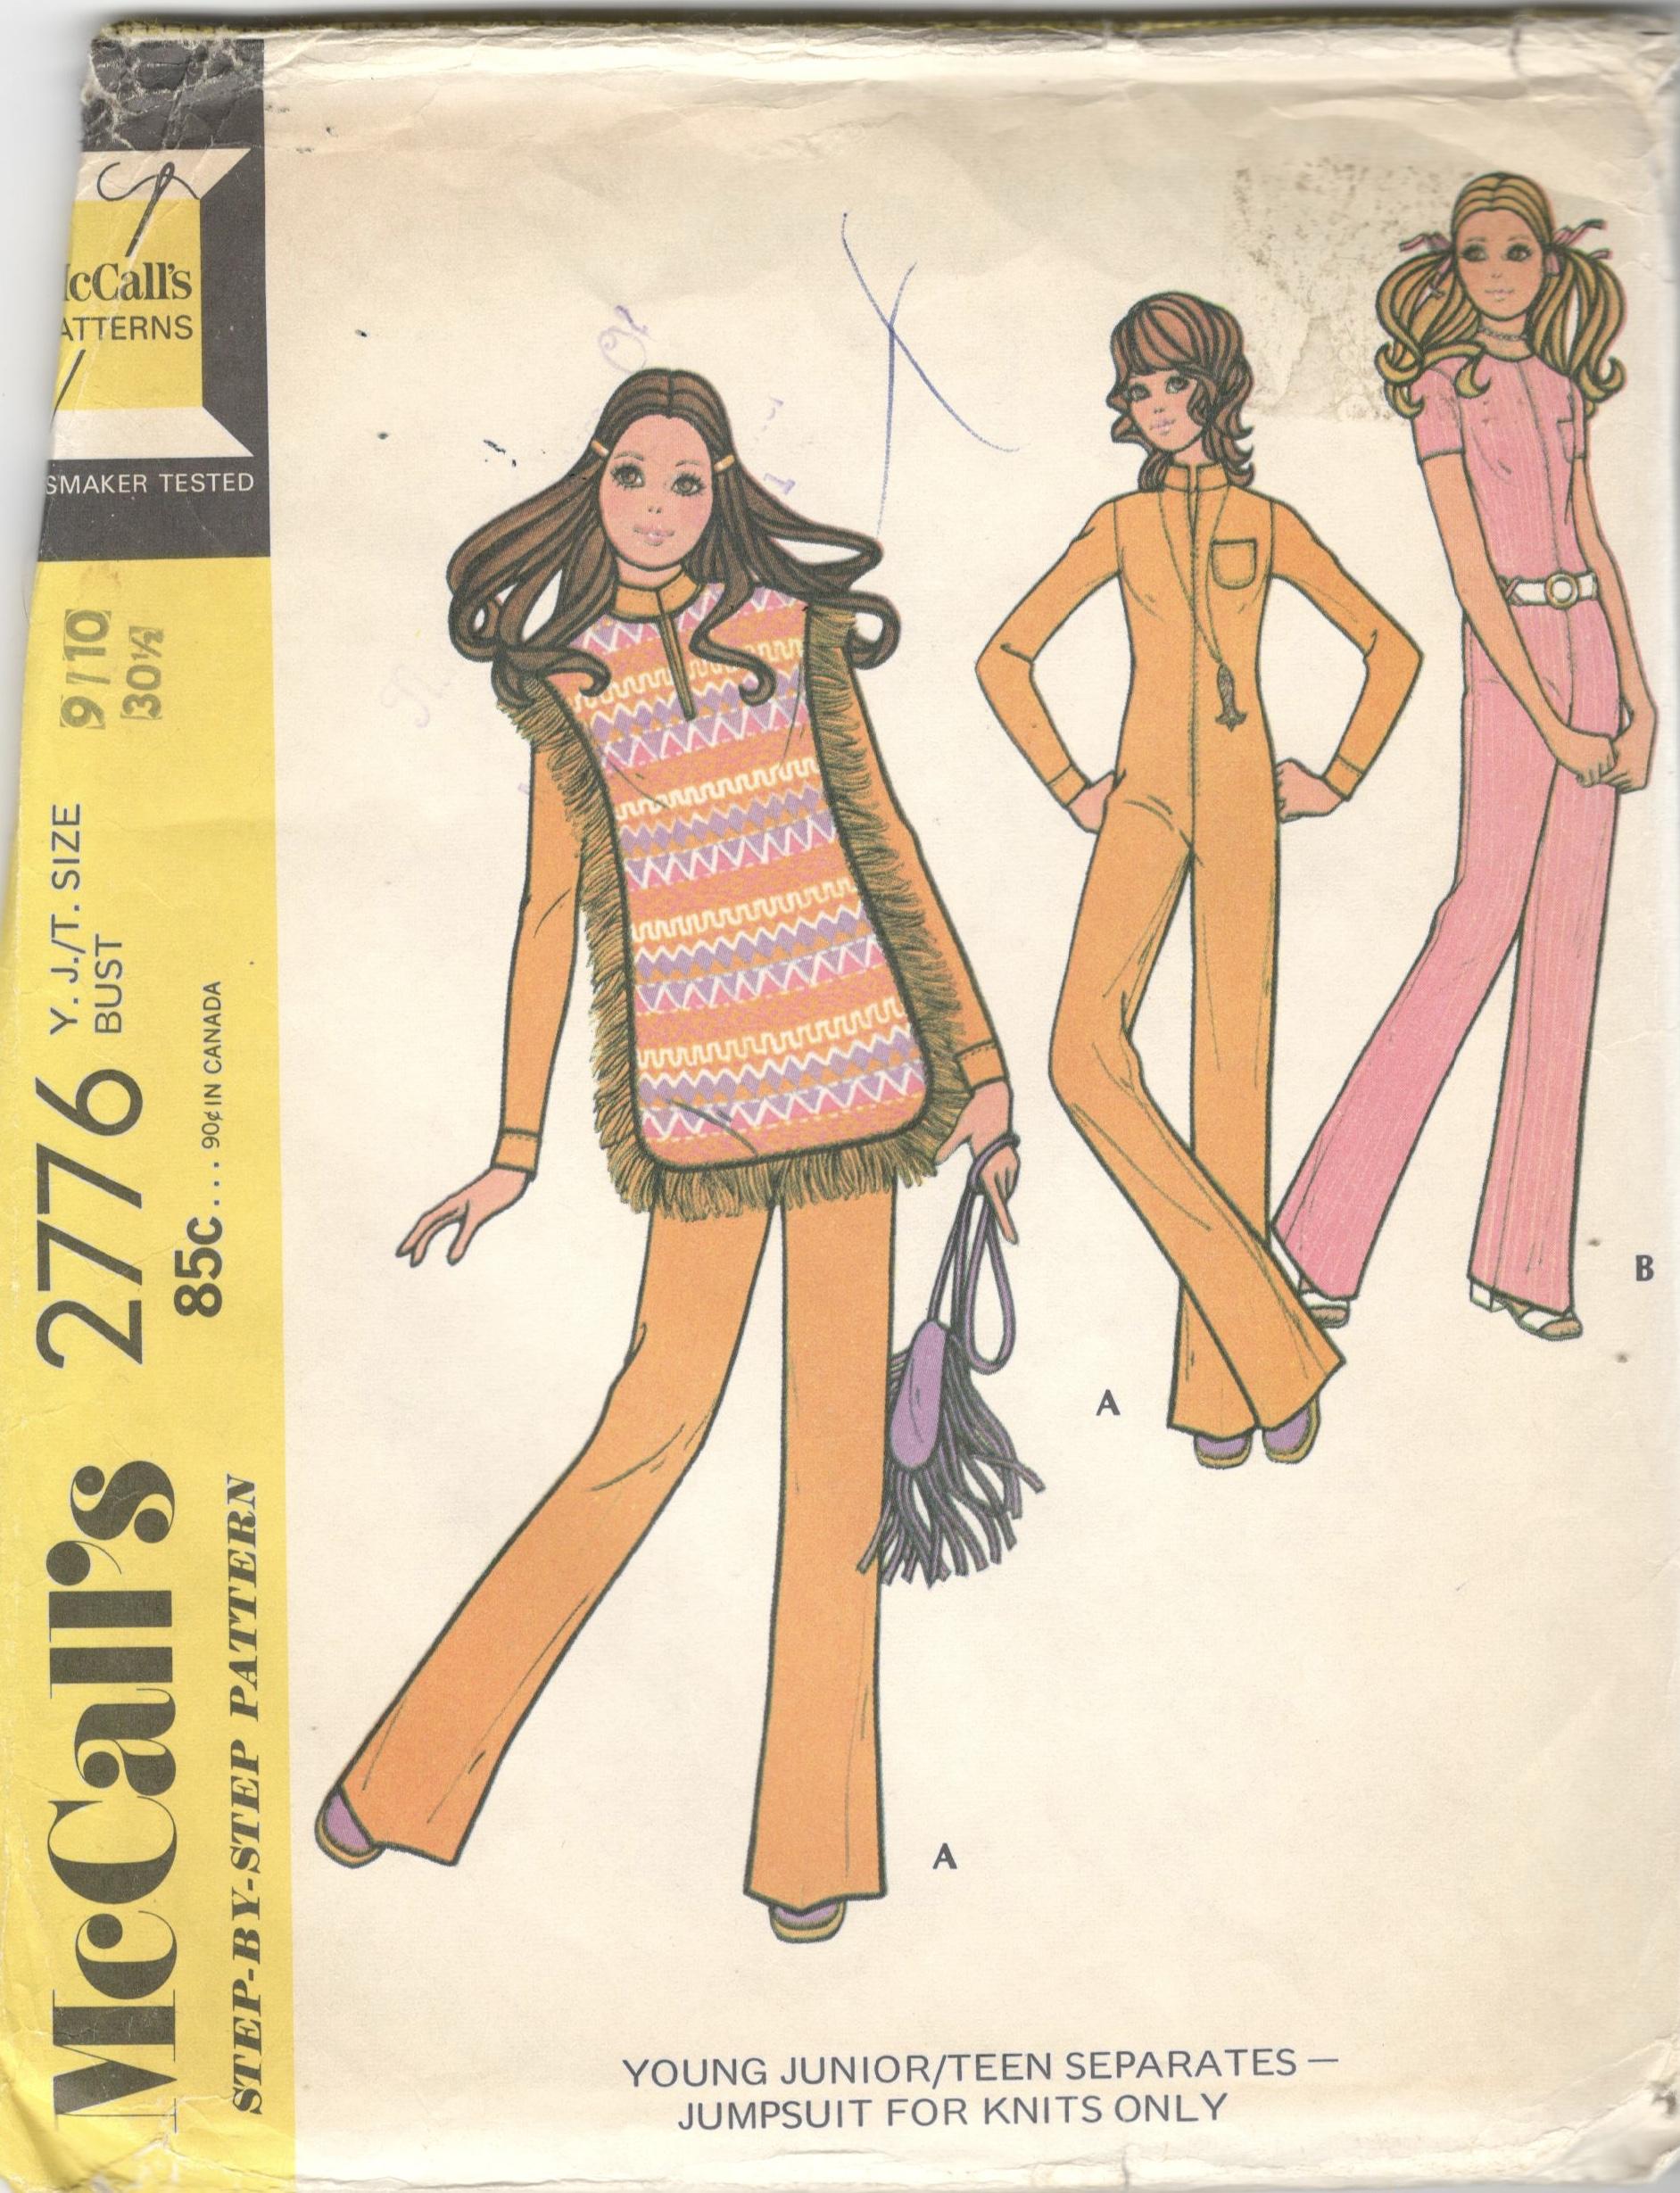 McCall's 2776 A